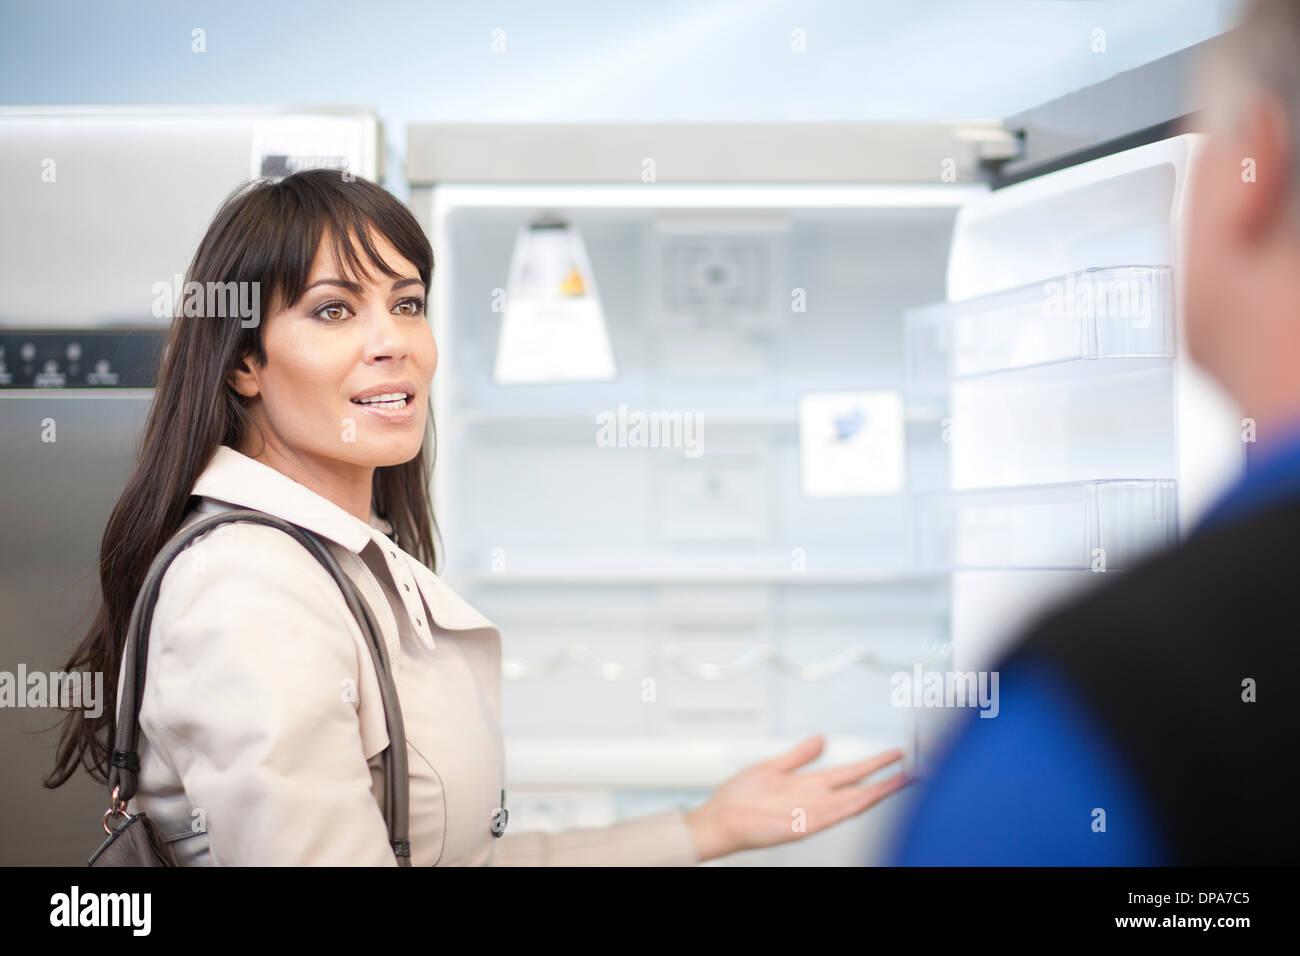 Woman looking at fridge in showroom - Stock Image